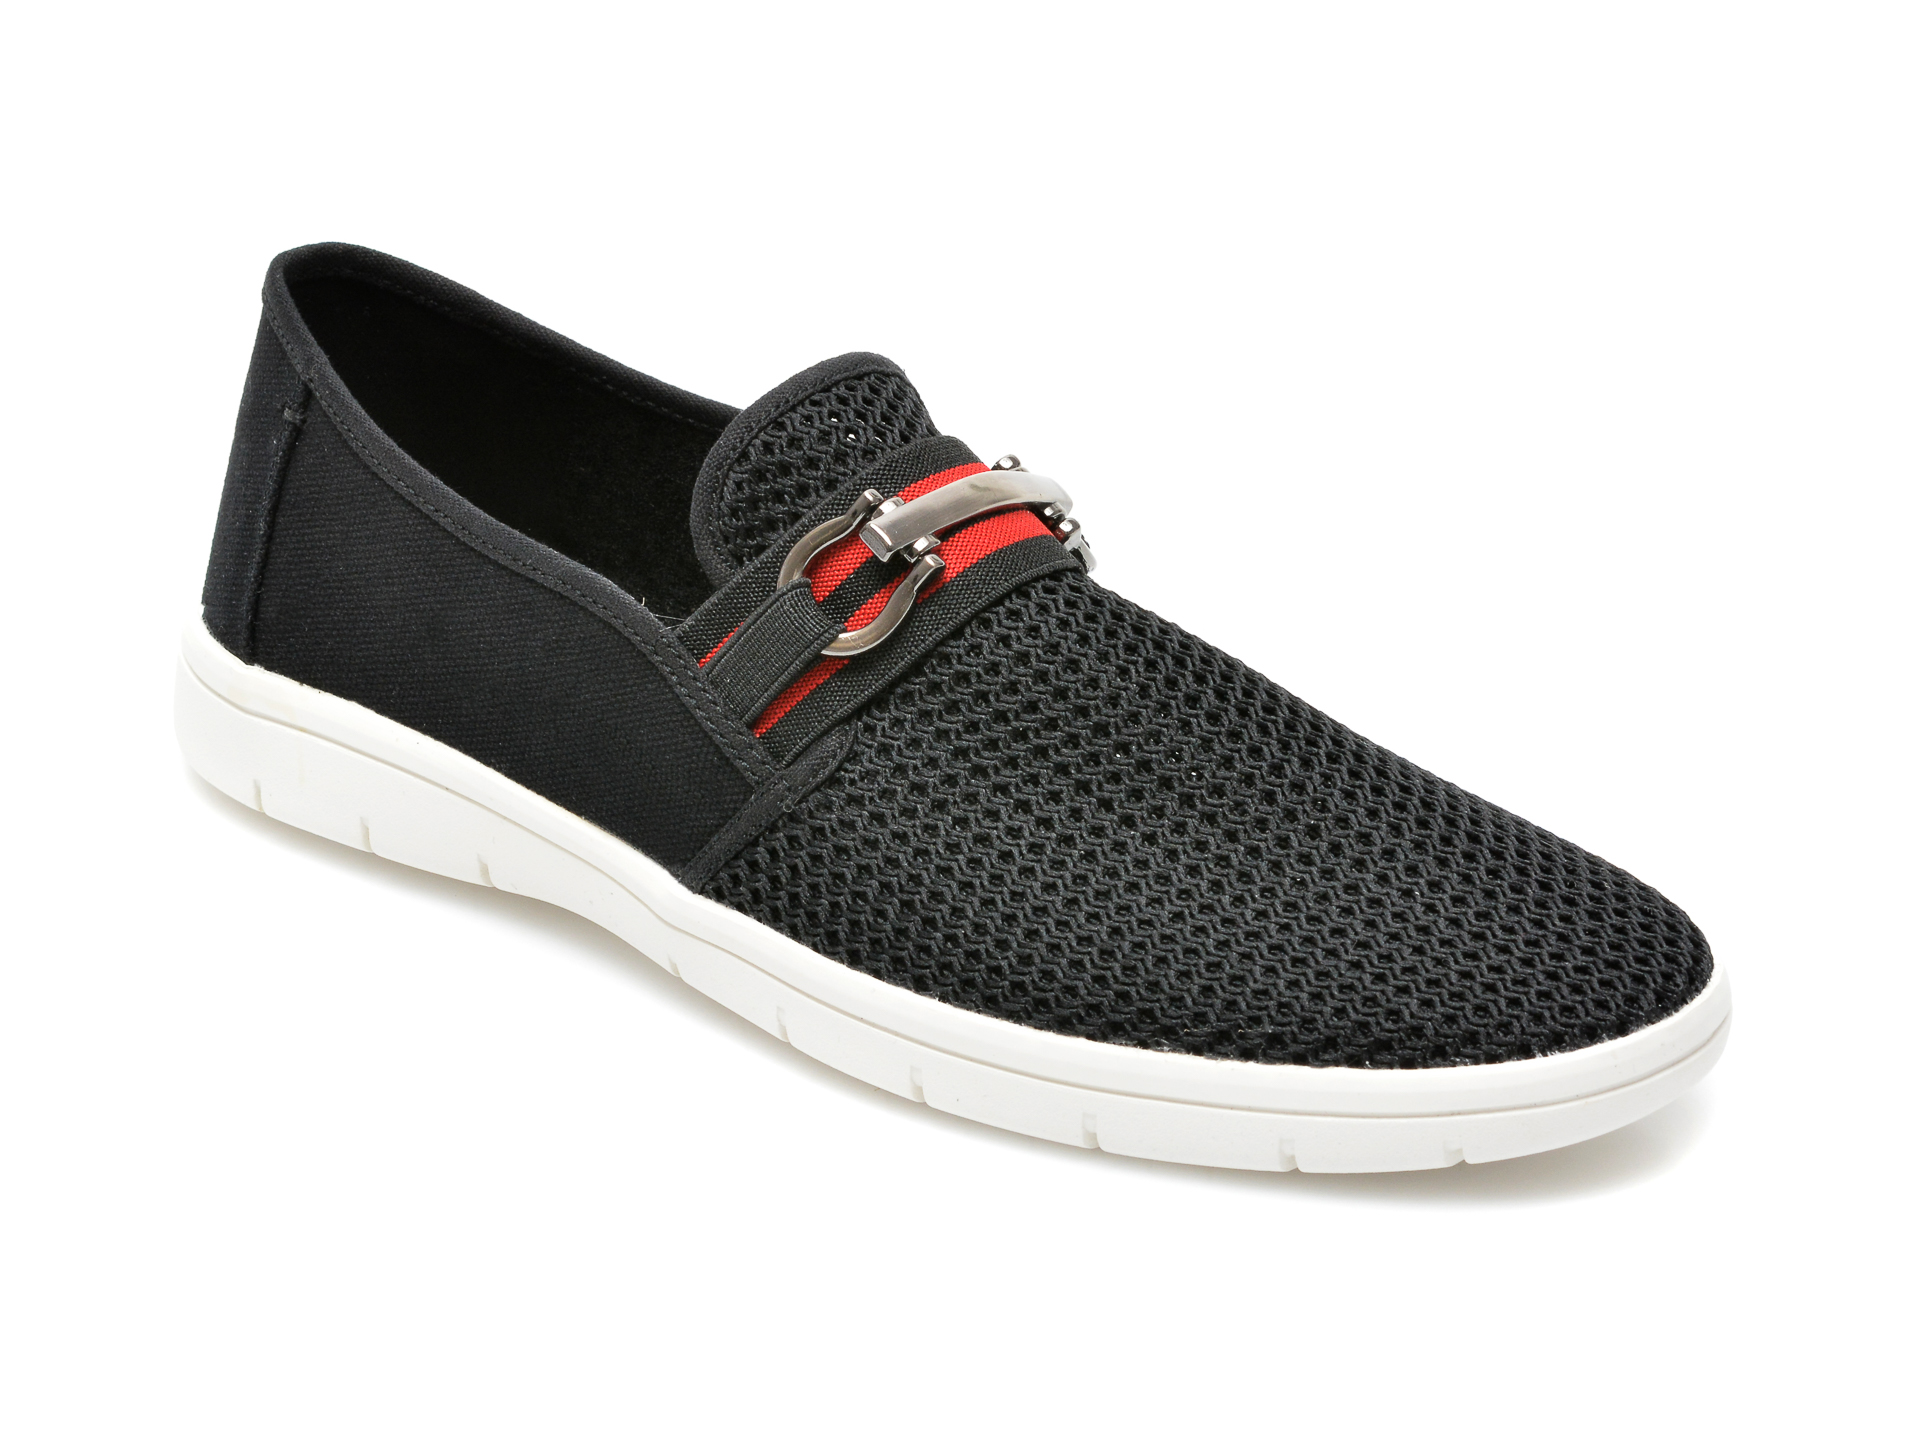 Pantofi ALDO negri, Kaeriven001, din material textil imagine 2021 Aldo